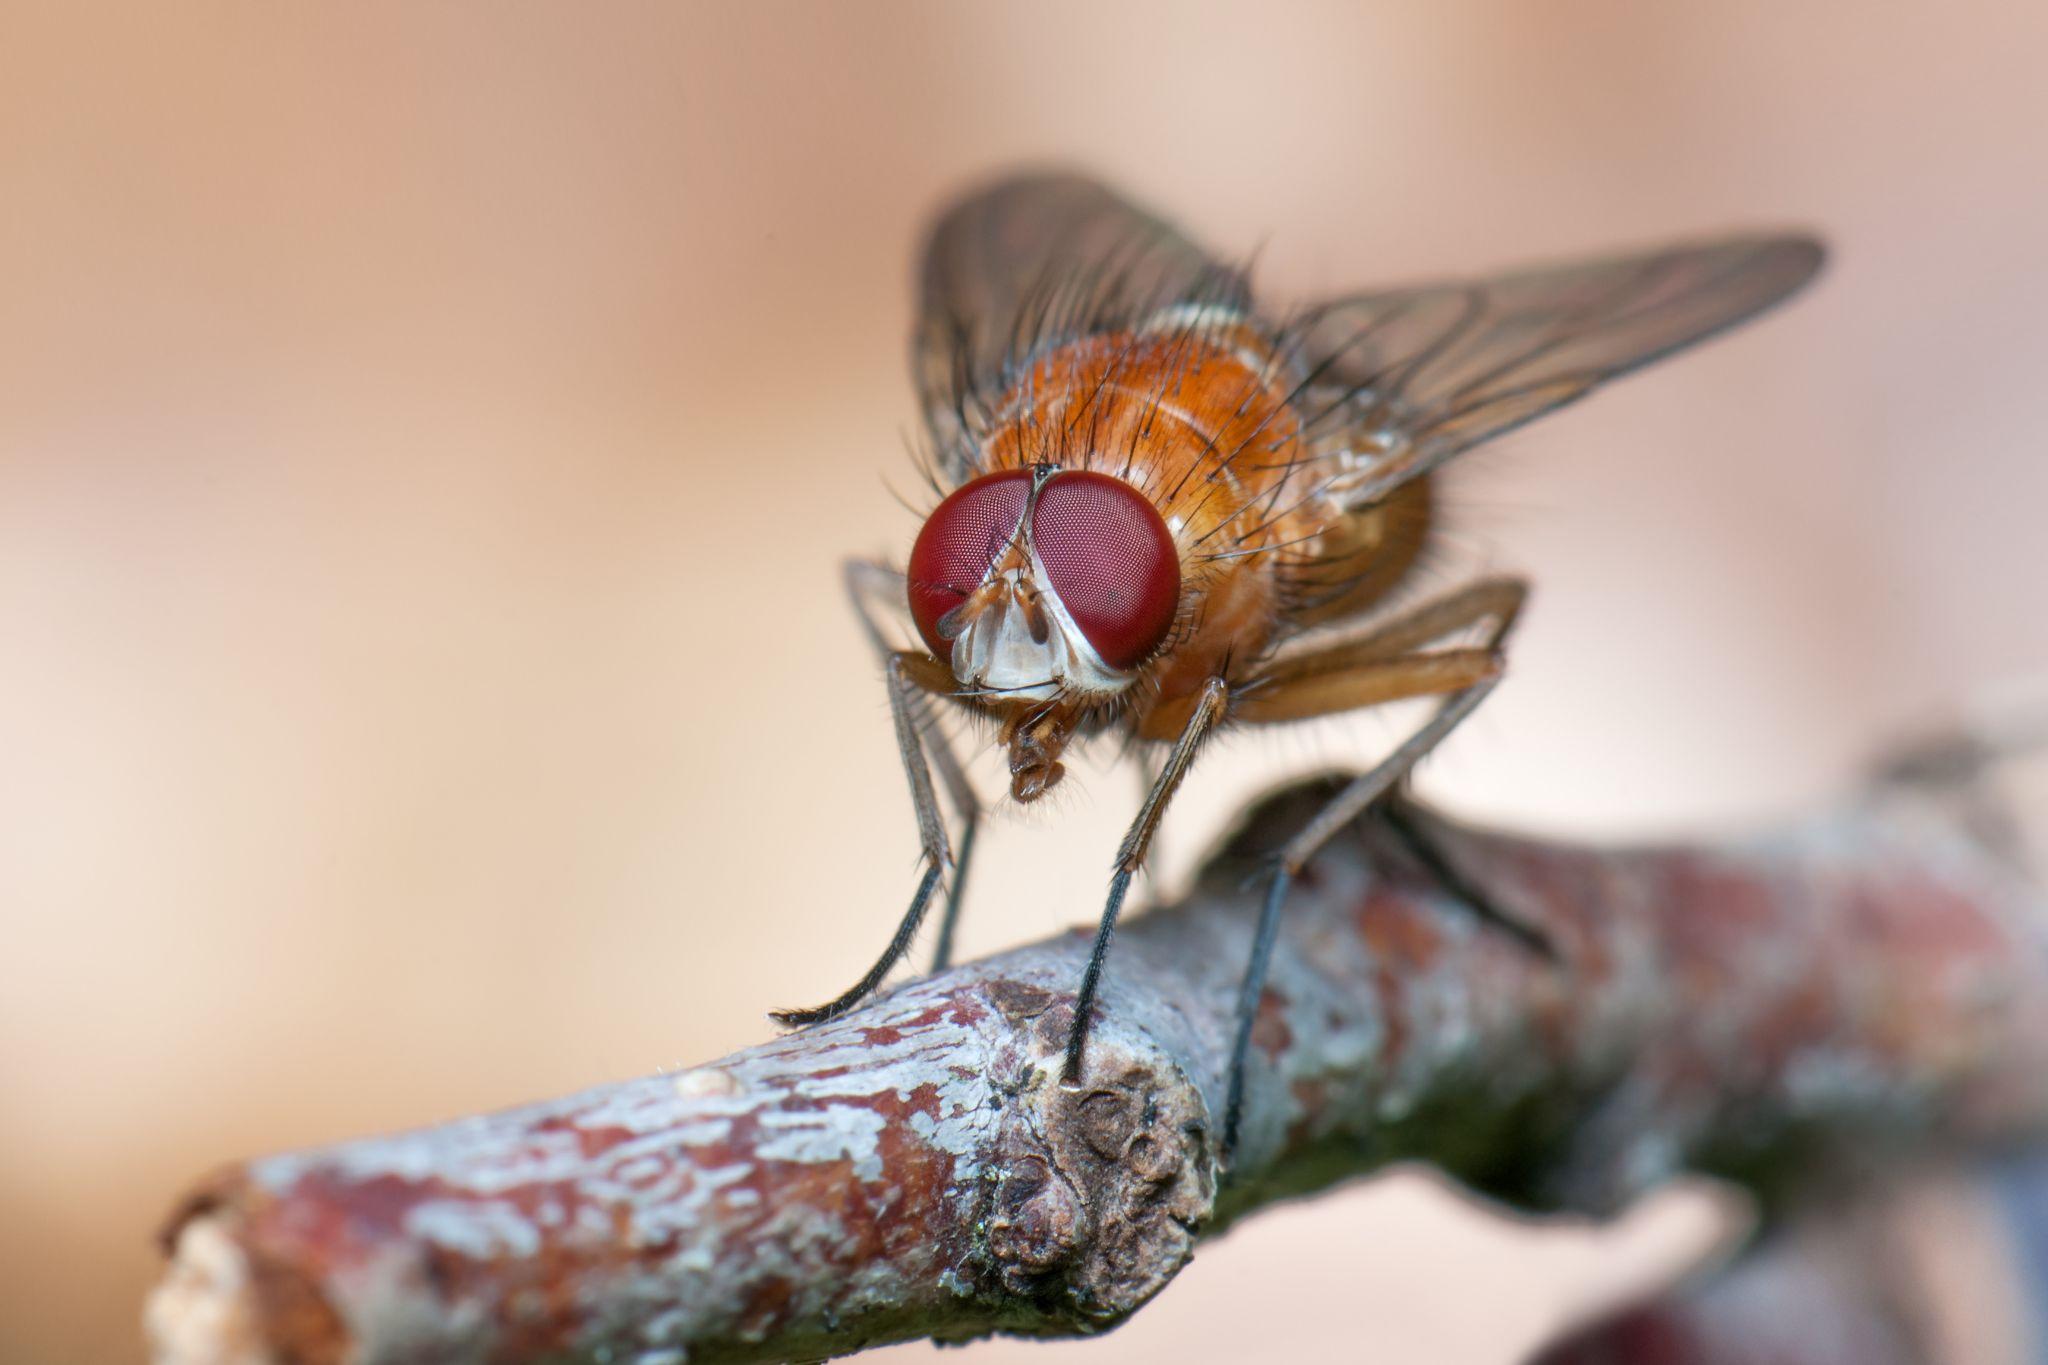 Red Fly by Wolfgang Korazija